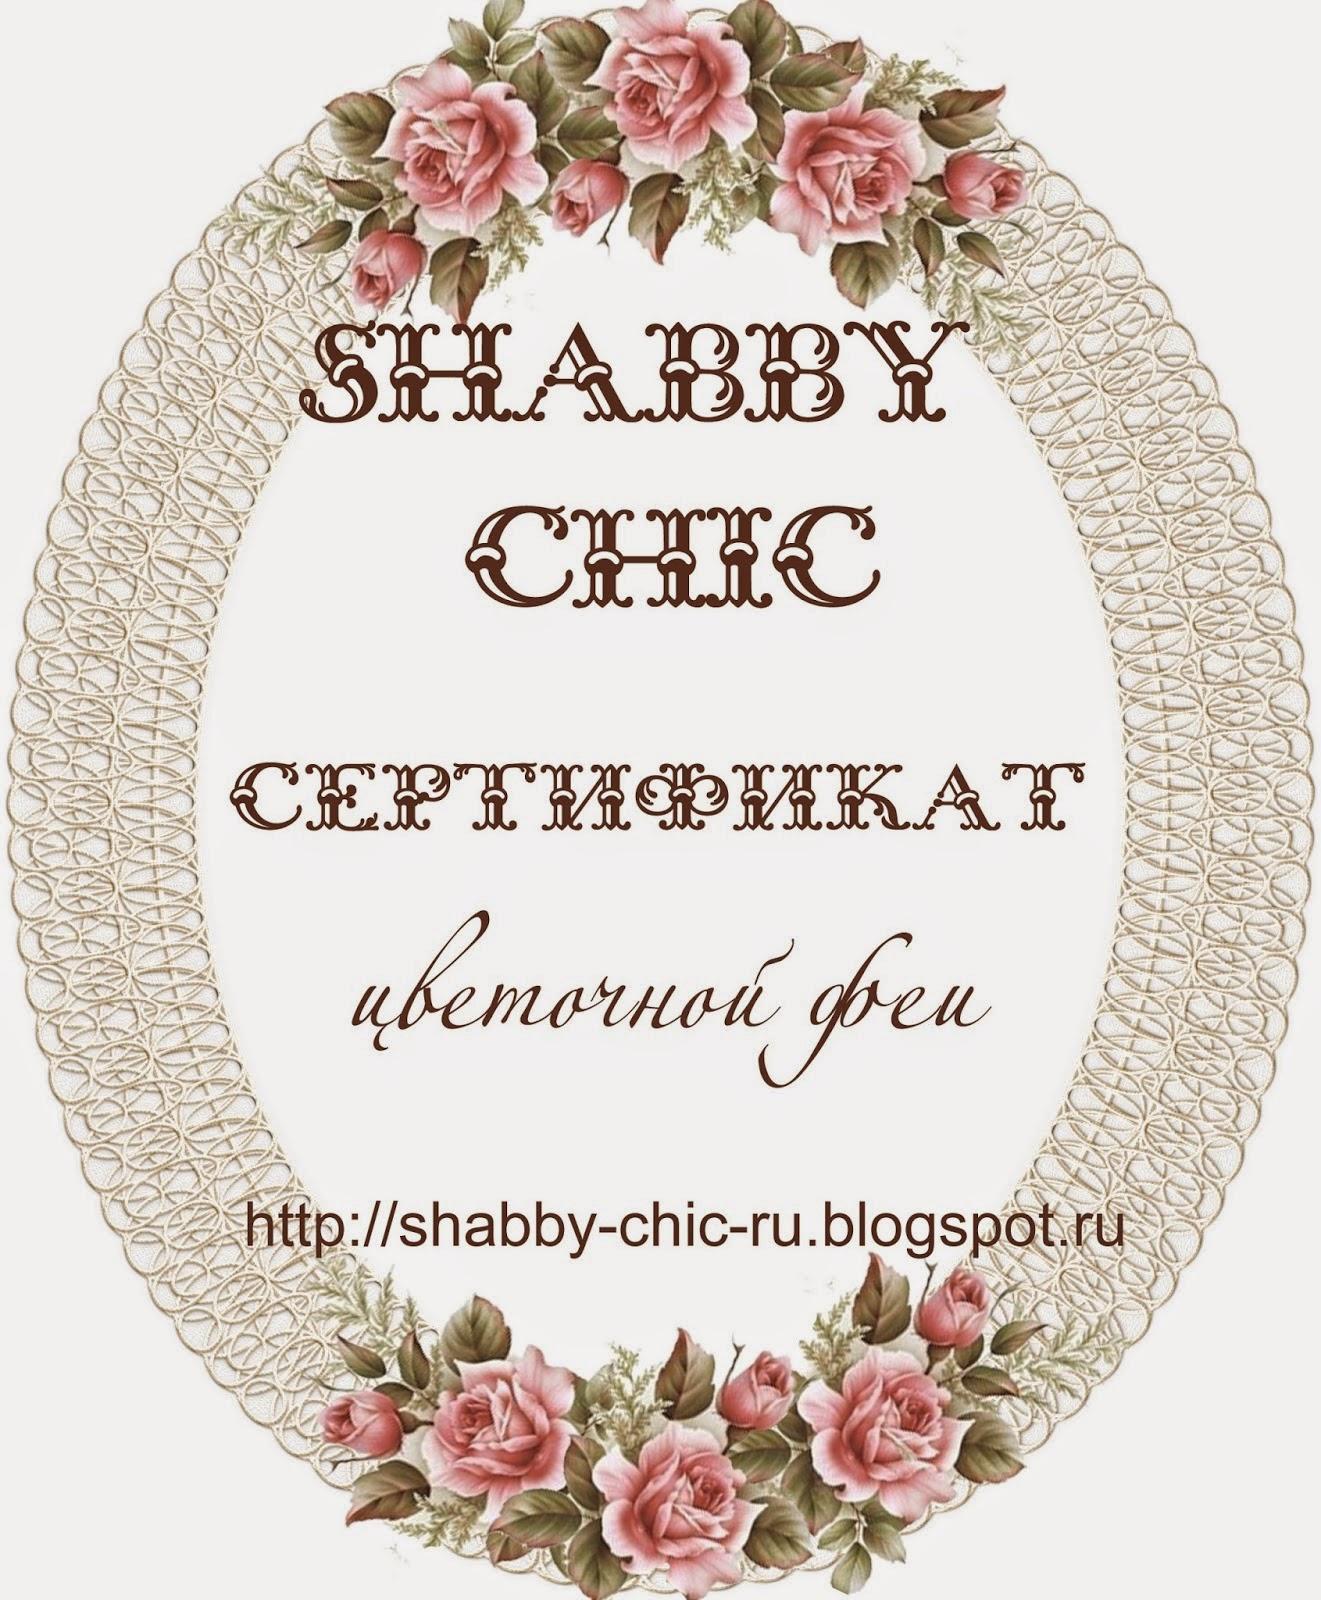 Я цветочная фея))))